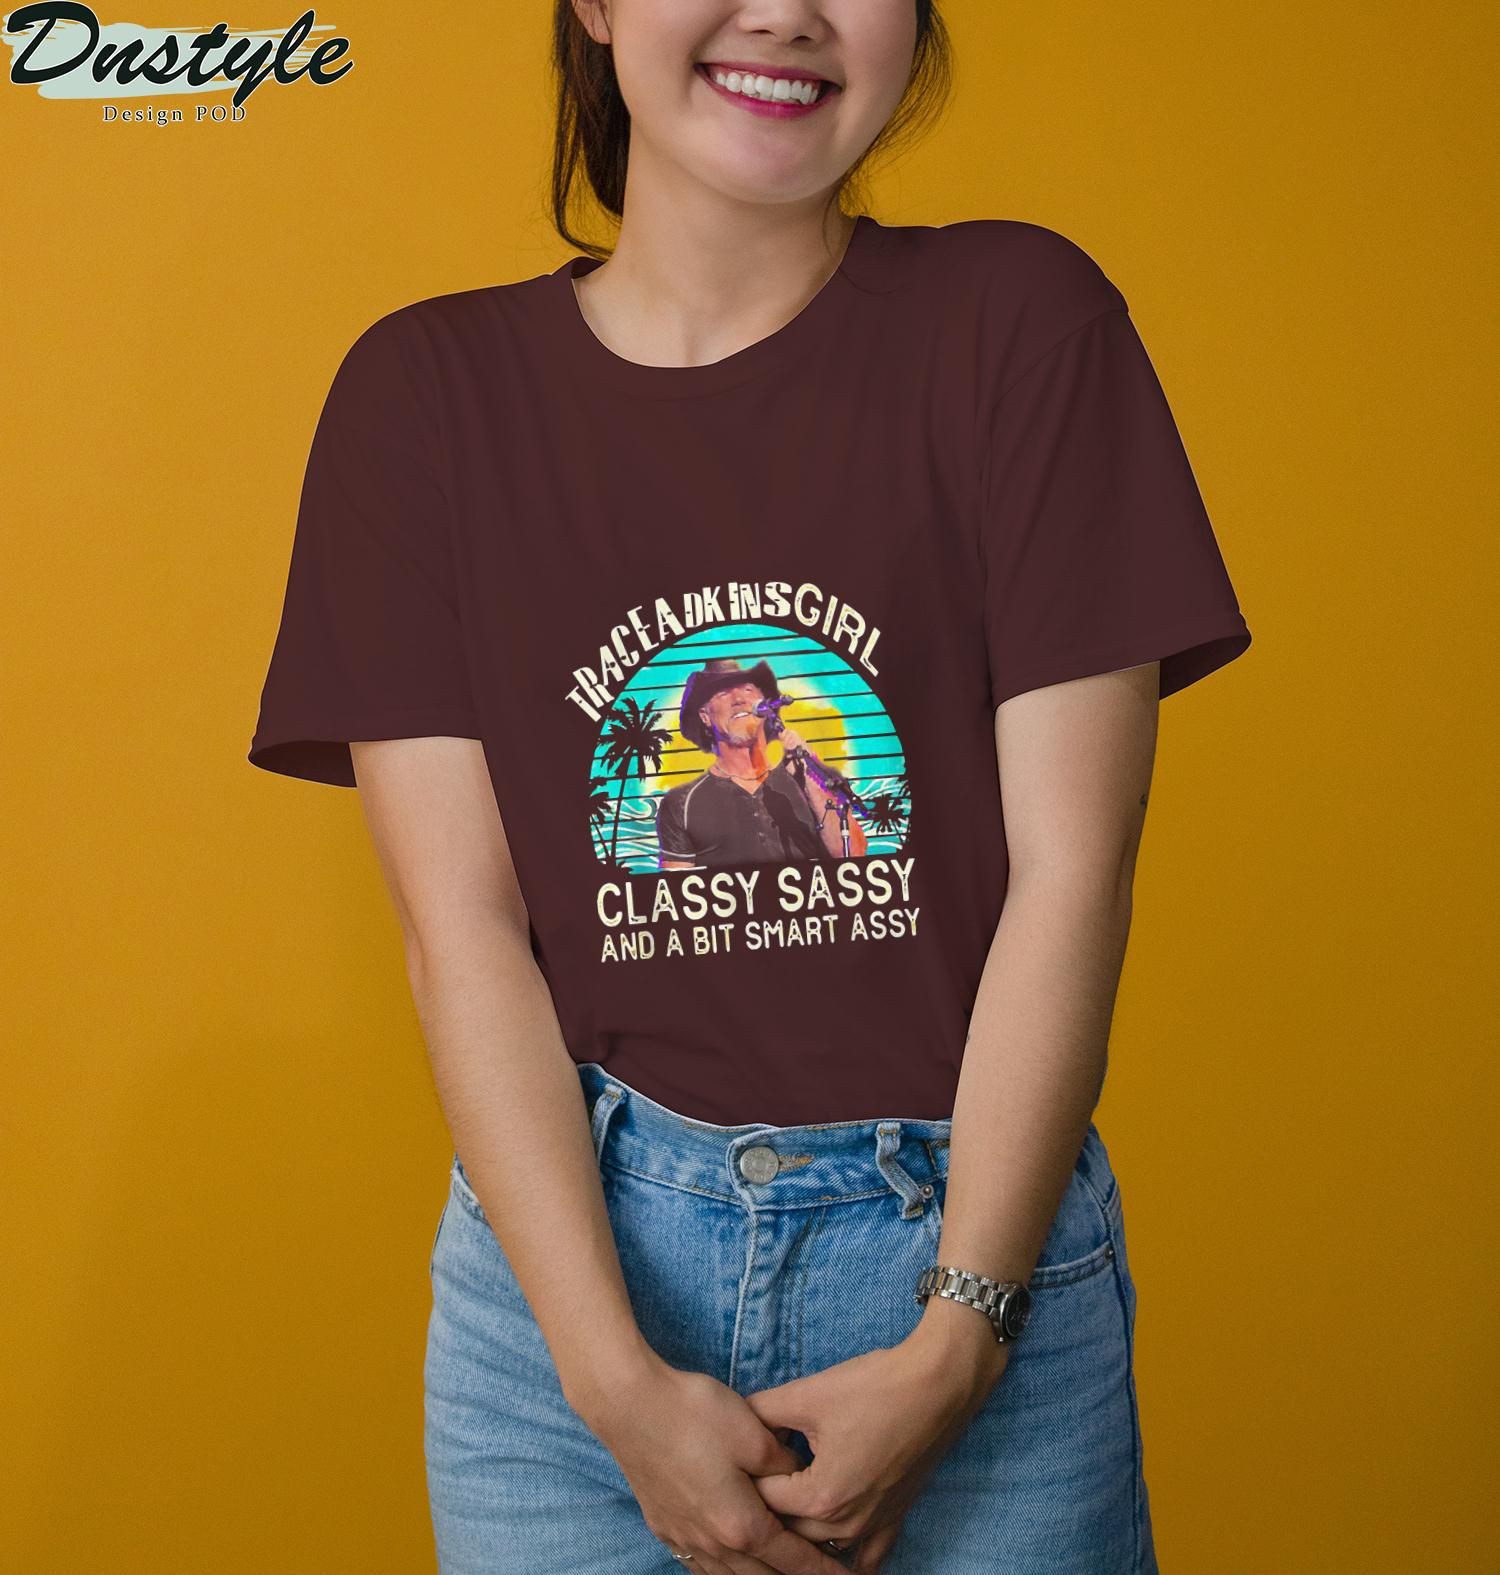 Trace Adkins Girl Classy Sassy And A Bit Smart Assy Retro T-Shirt 3